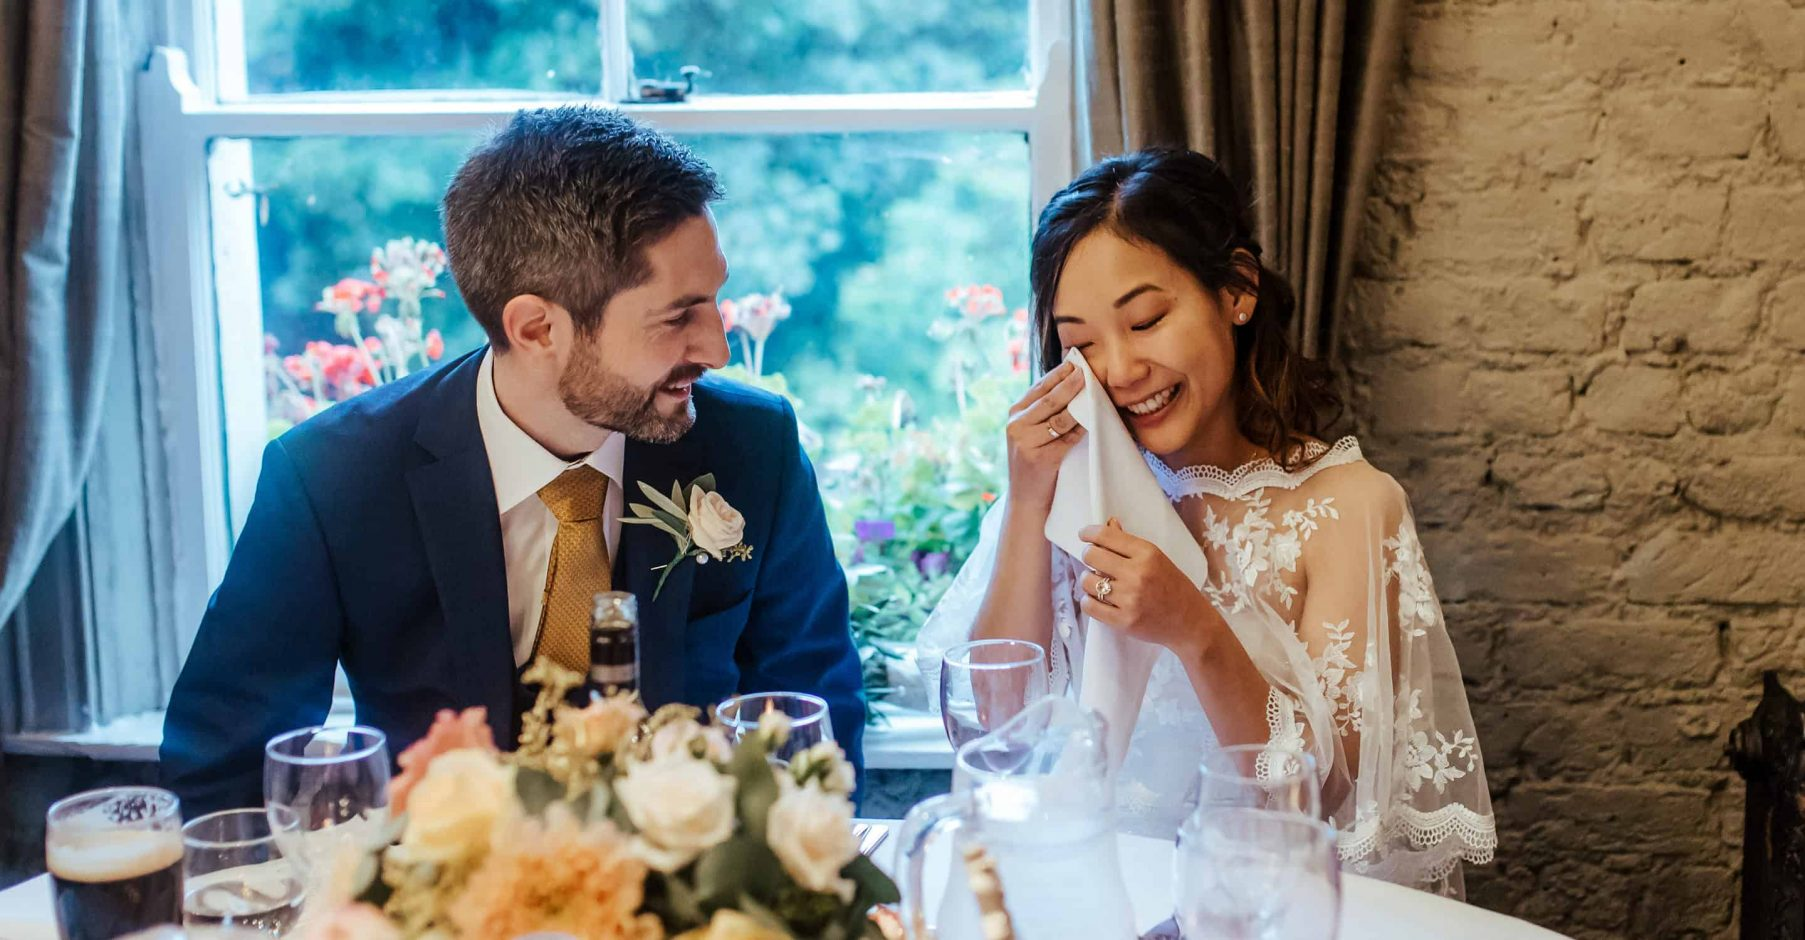 ireland-wedding-photographer-14